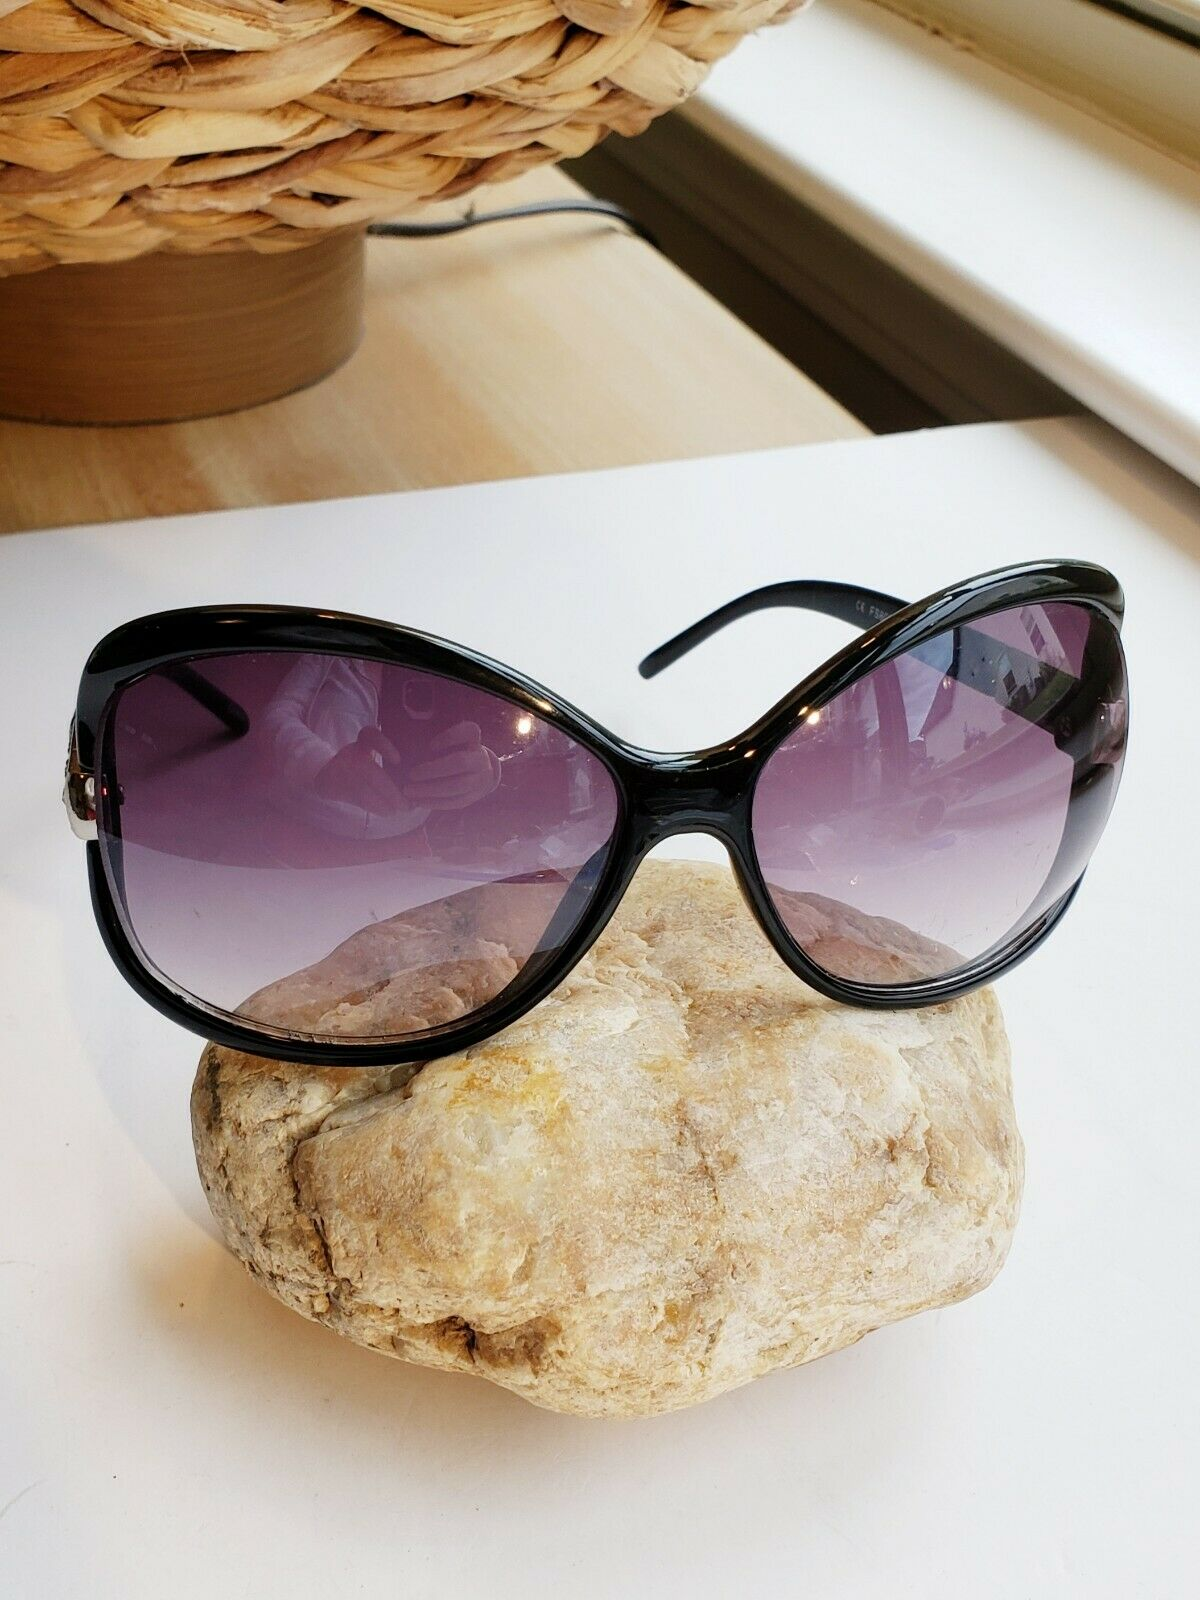 Franco Sarto Eyewear Sunglasses Black Design Oversized Butterfly CE FS8007-0141